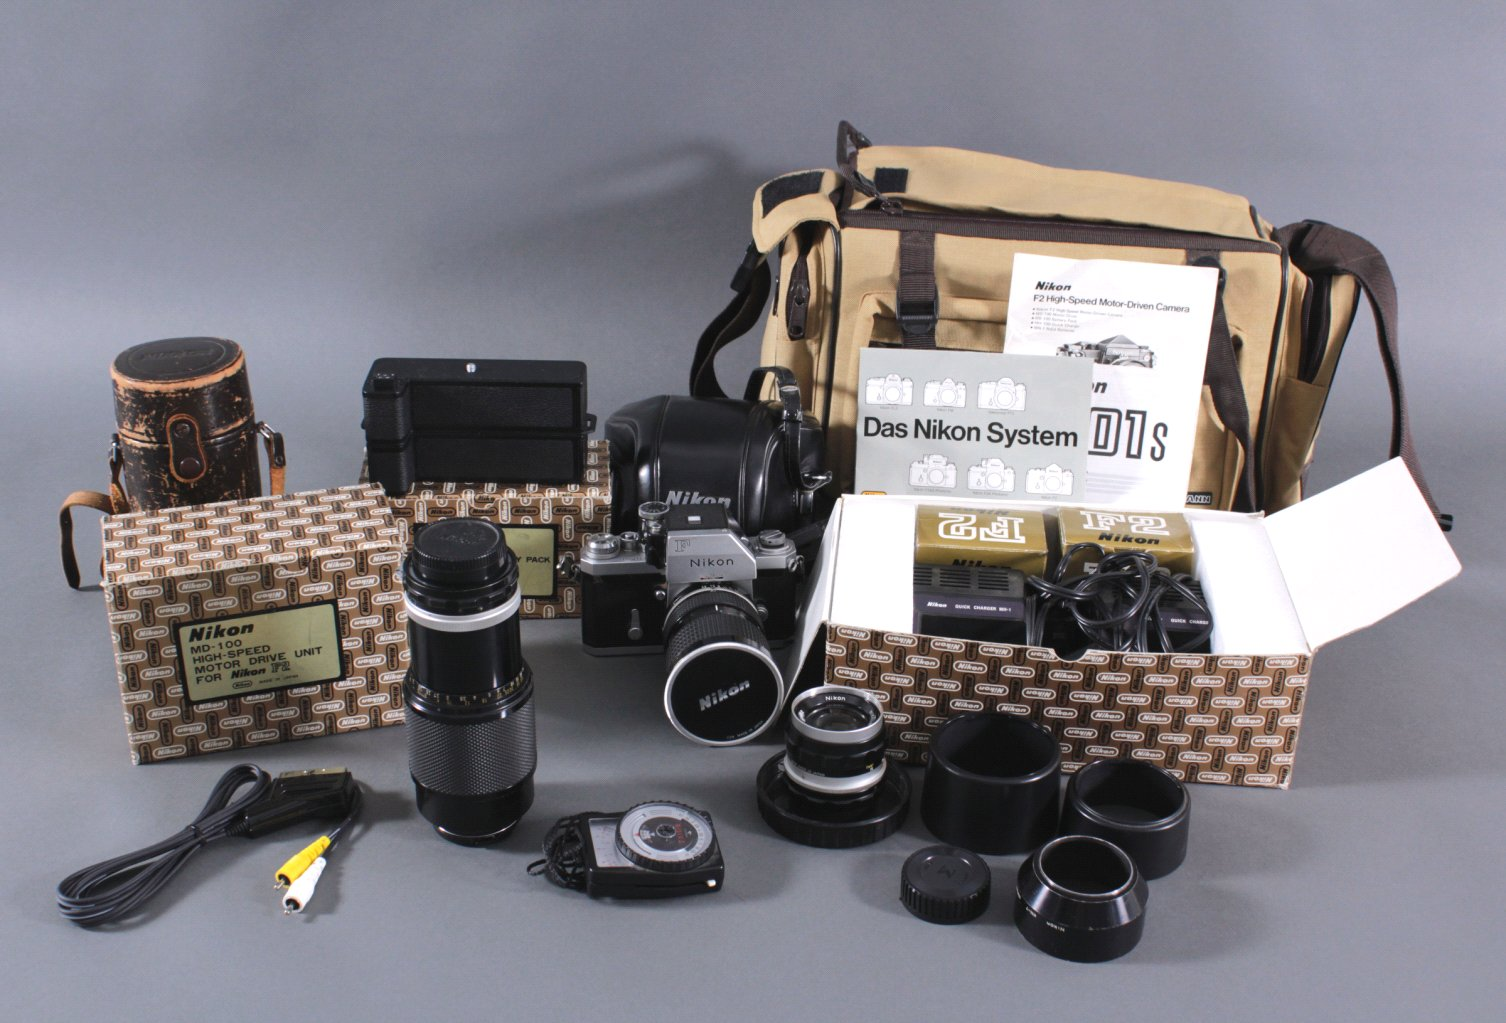 Niokon F2 Kamera mit Zubehör